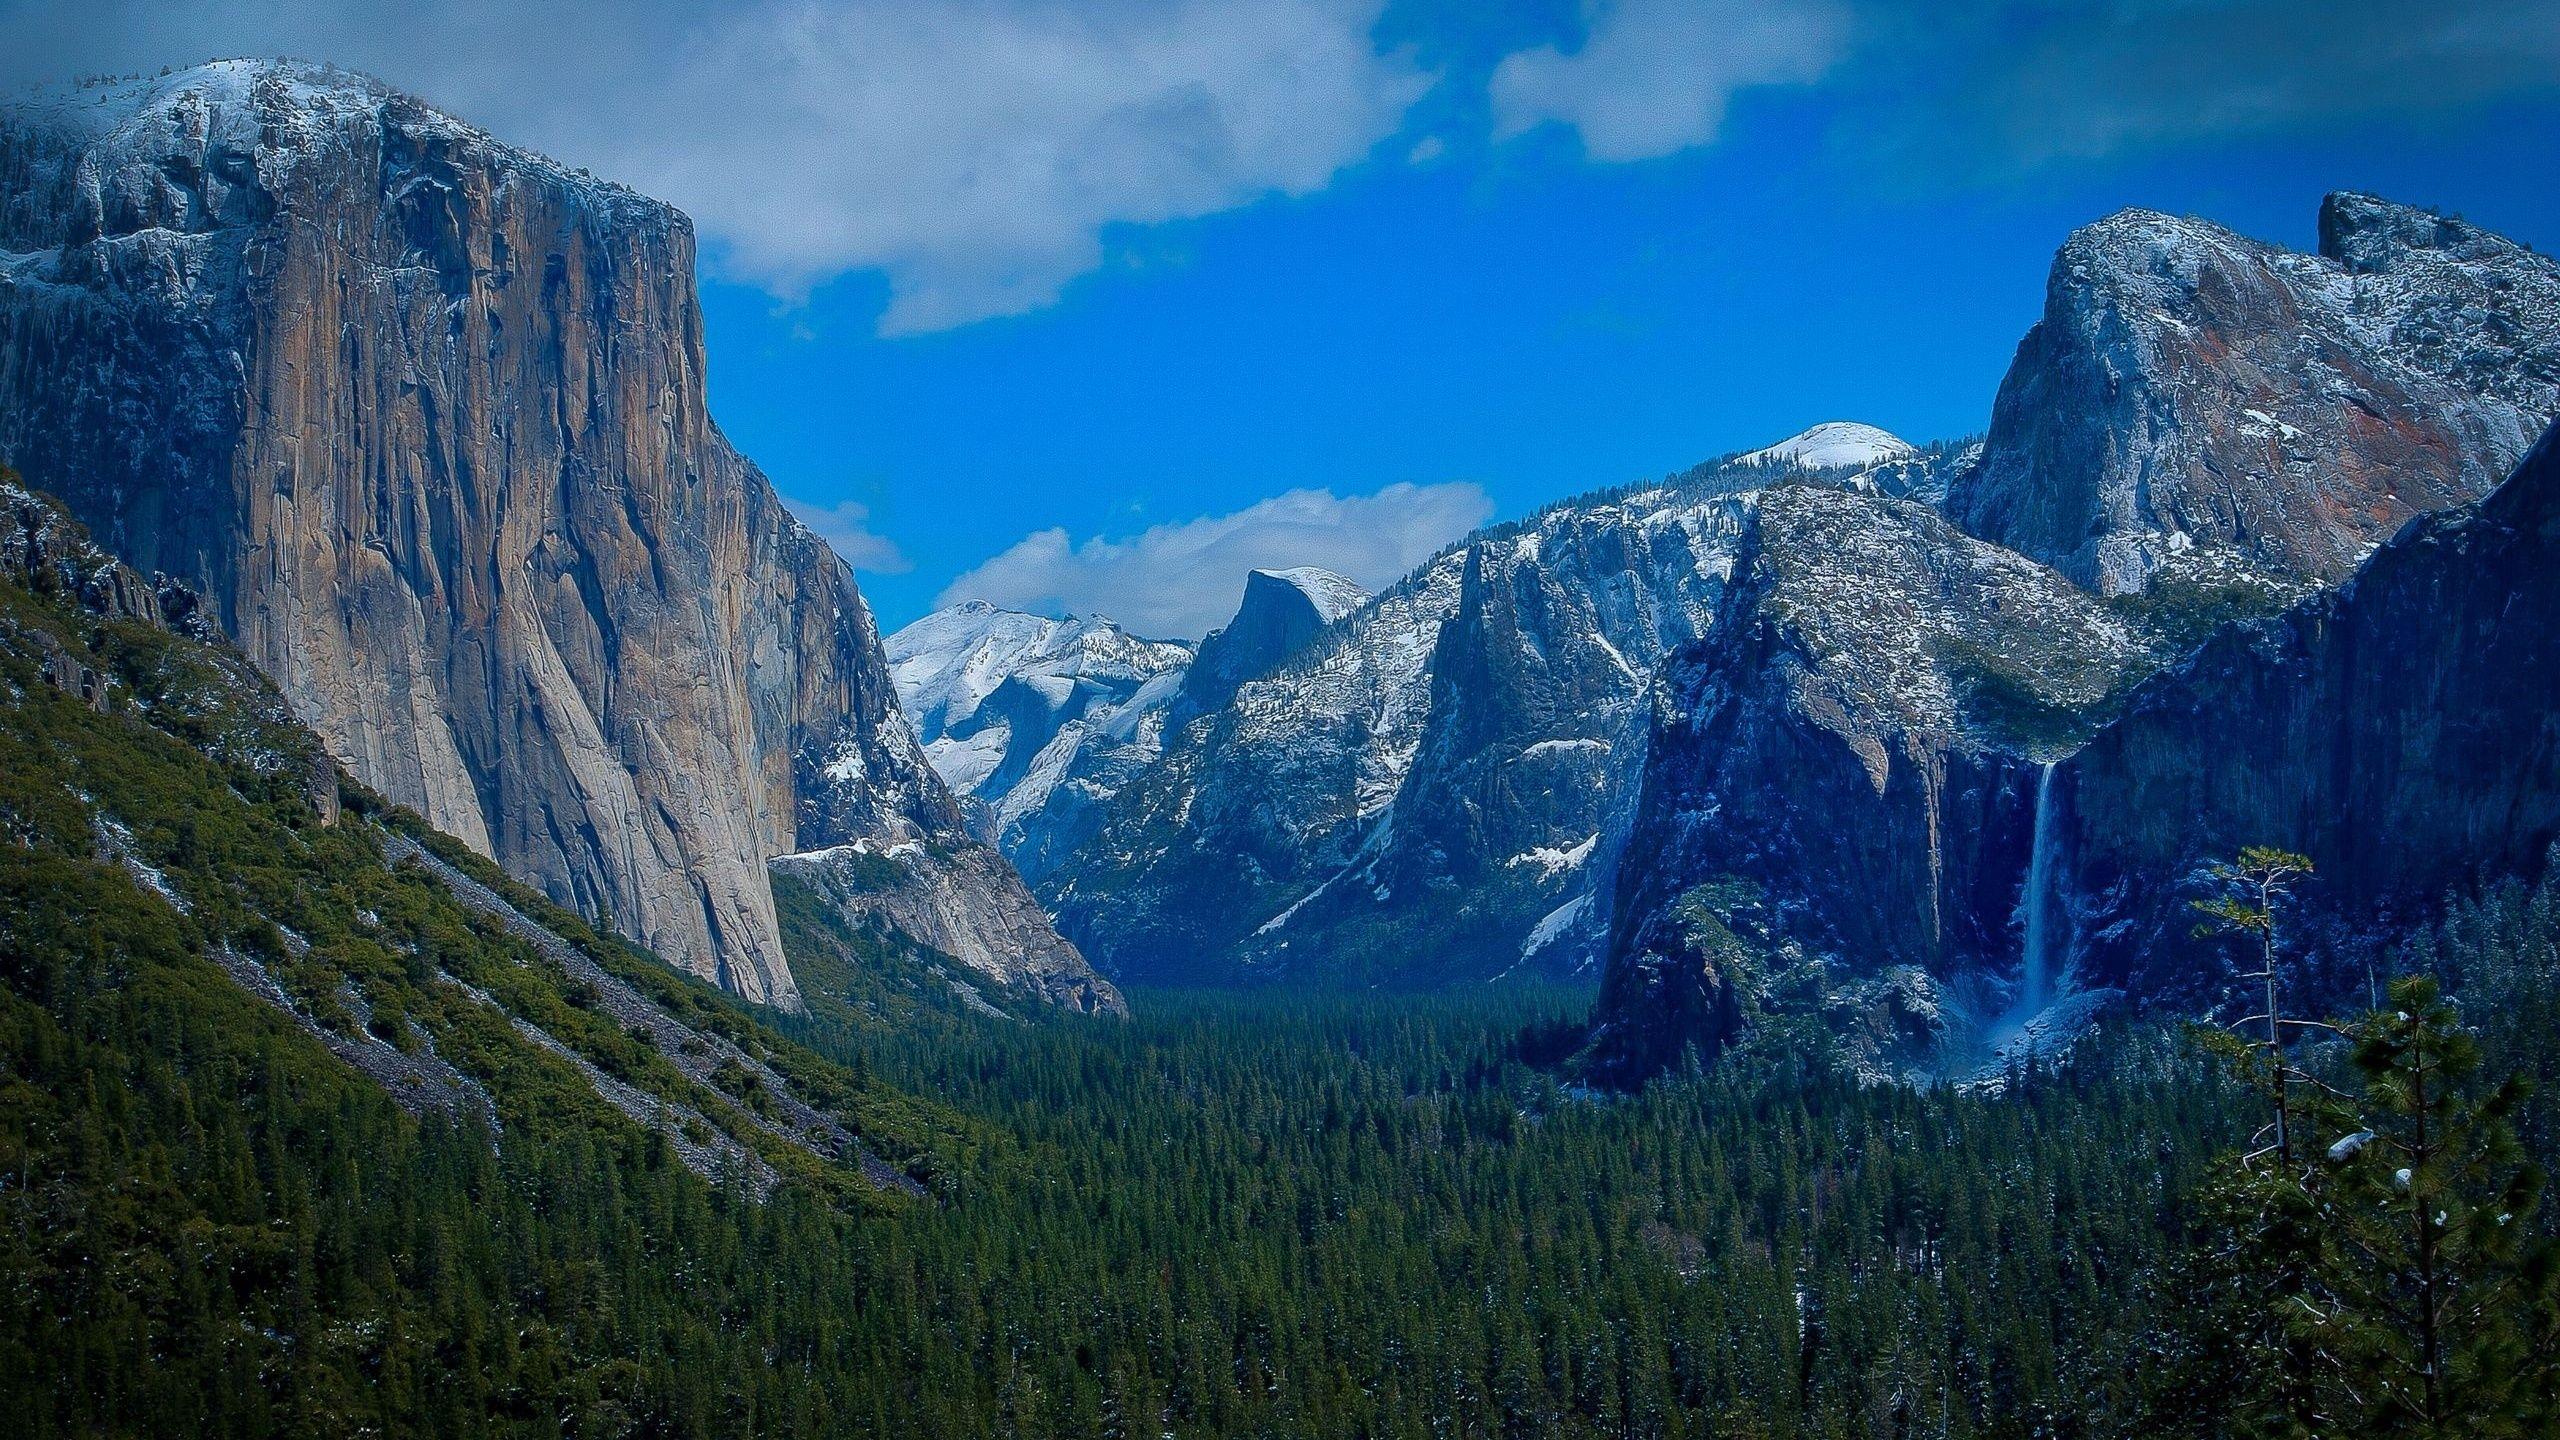 Yosemite National Park Wallpapers Digitalhintnet 2560x1440